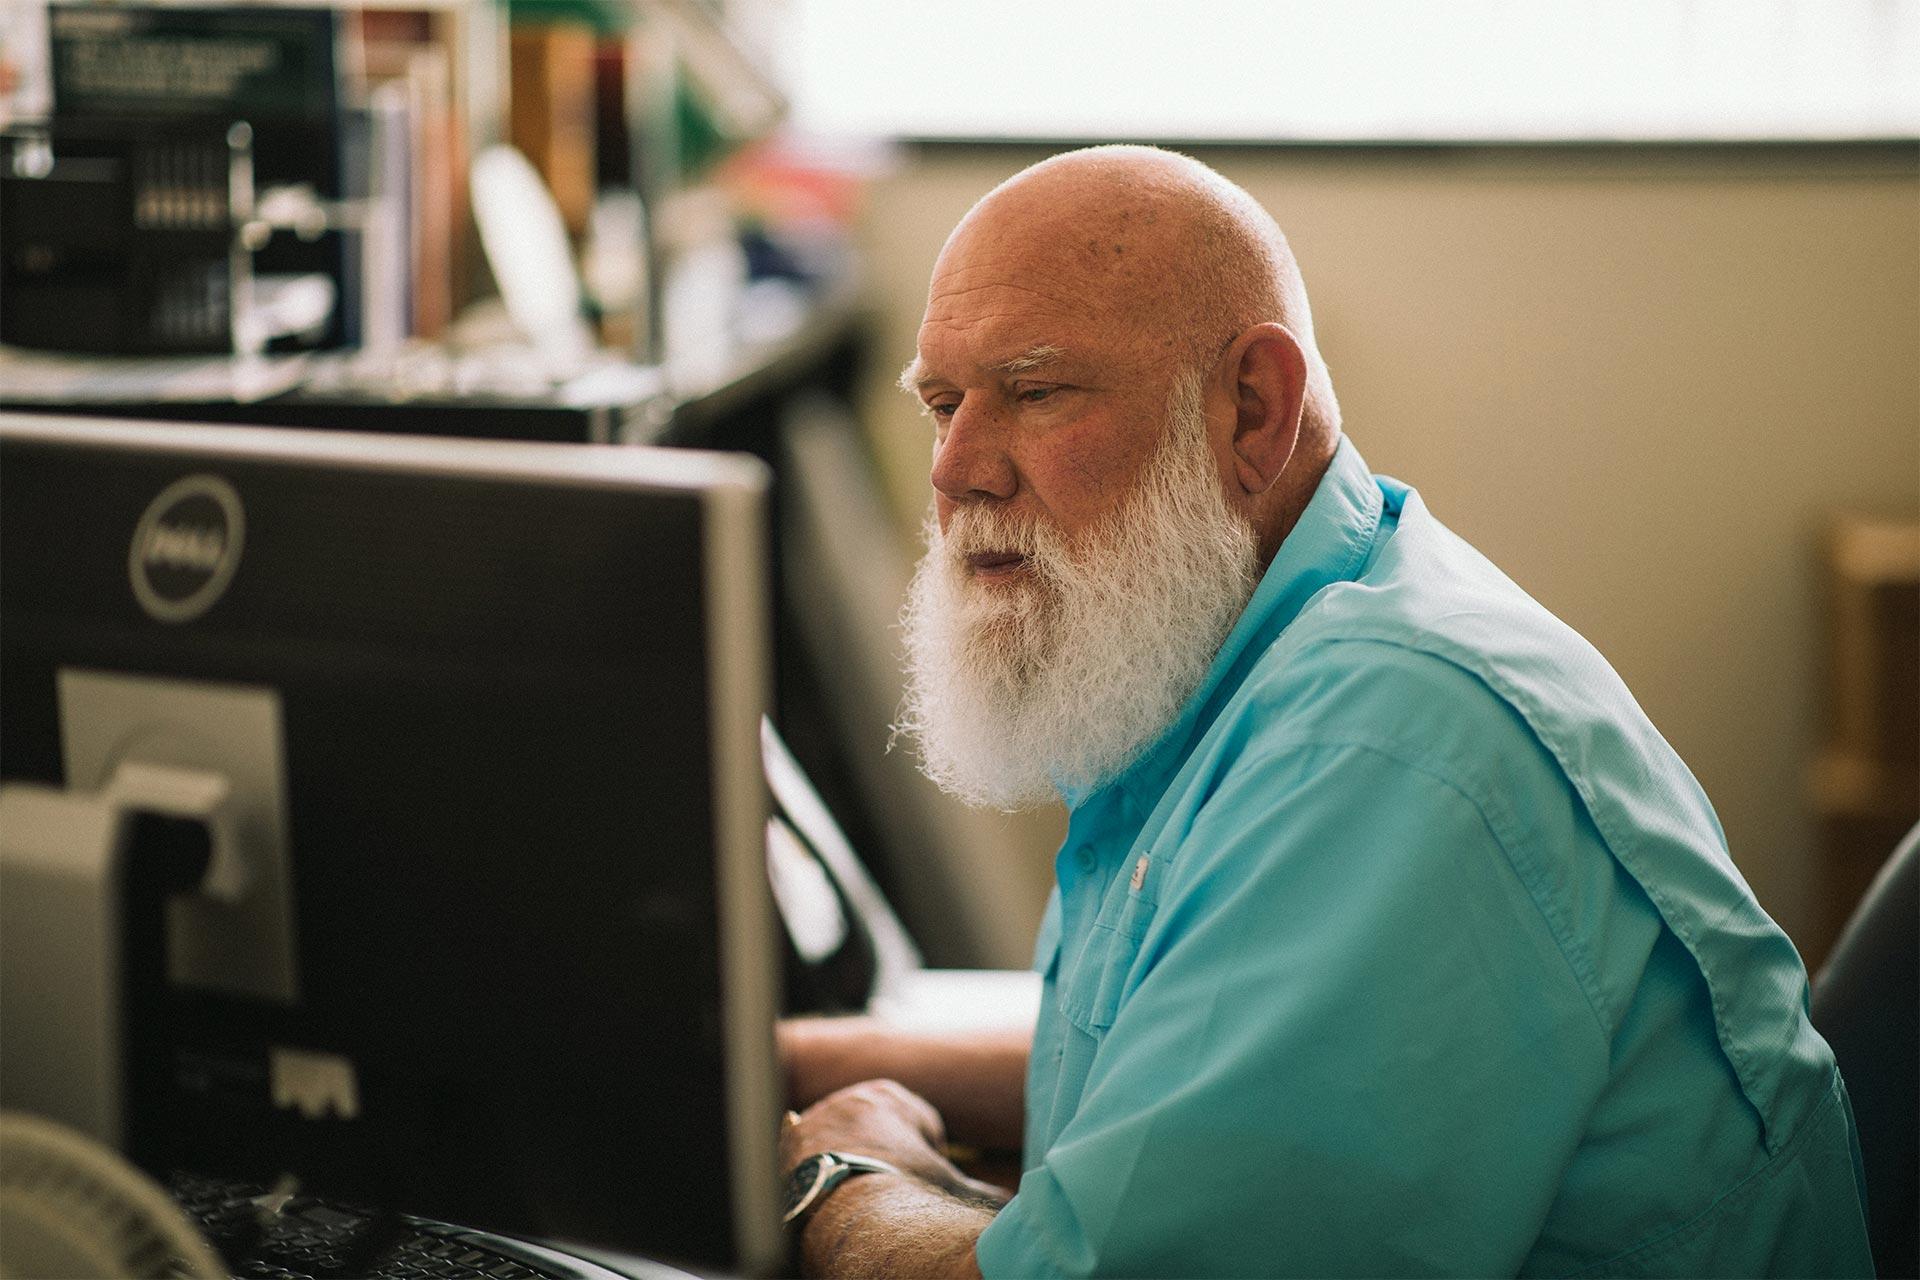 Patrick Gooding working at a computer